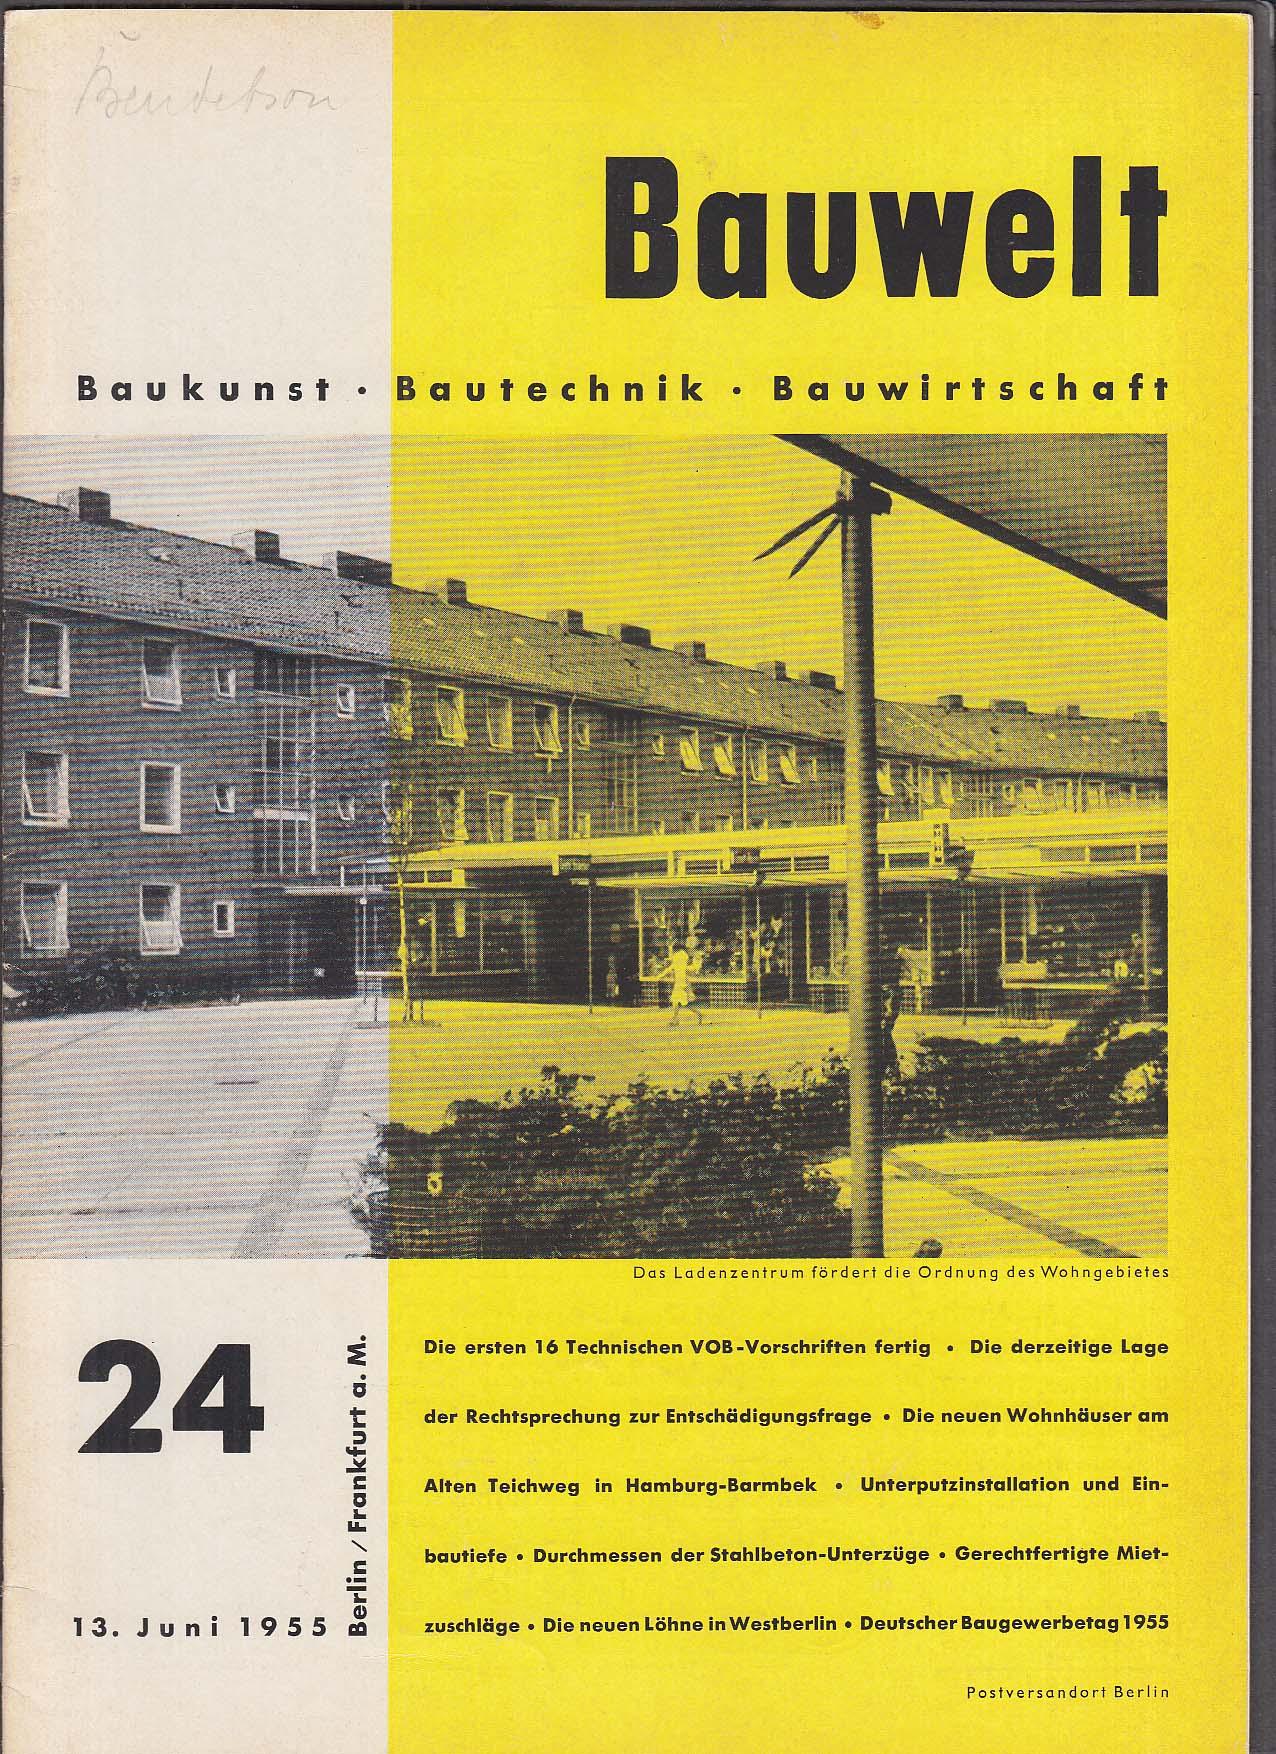 Bauwelt German architecture magazine 6/13/1955 24